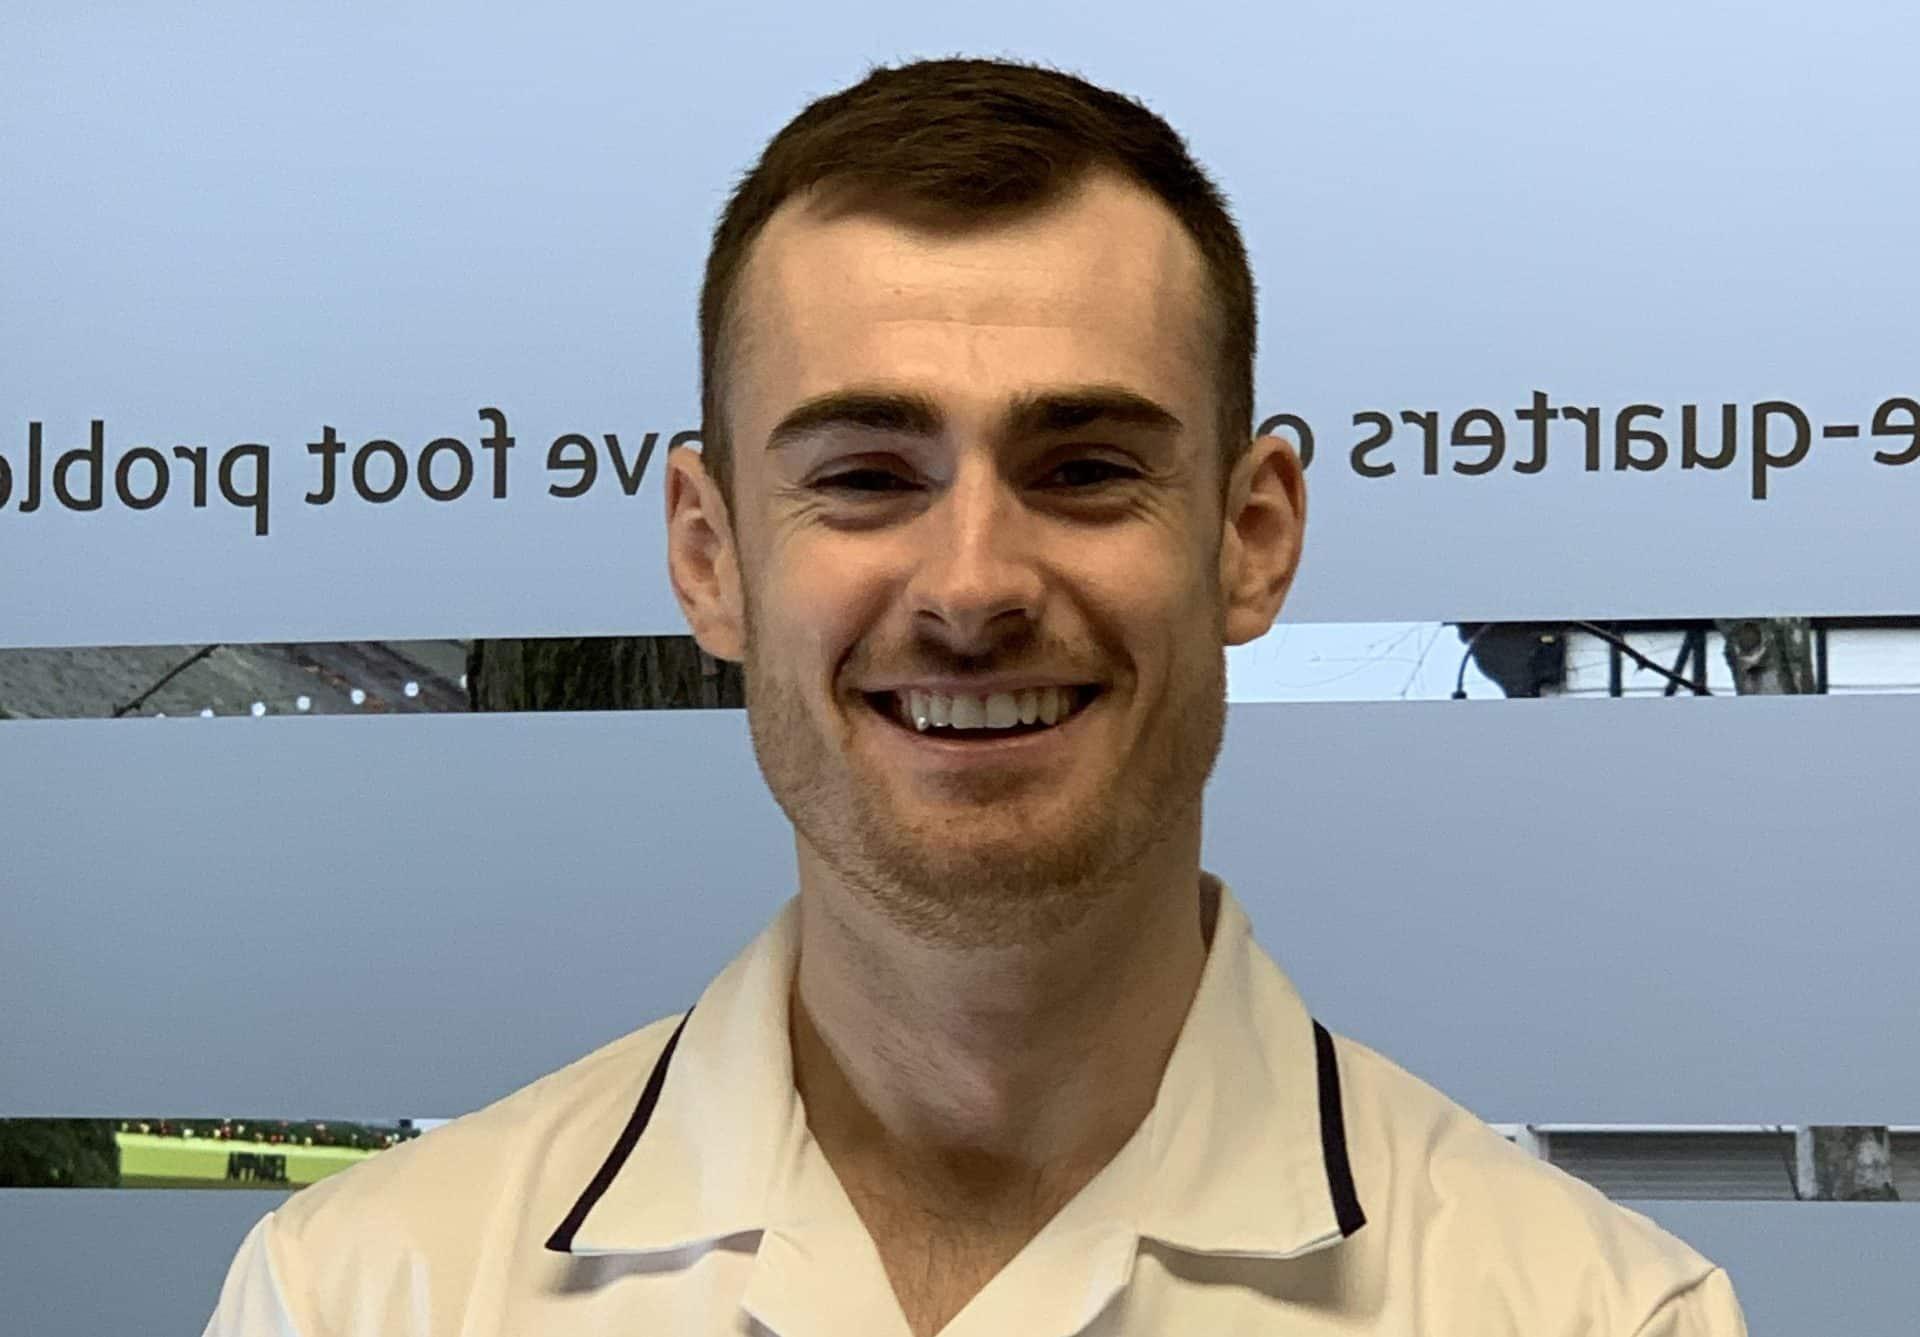 Tom Sandy Podiatrist Northwich Foot Clinic